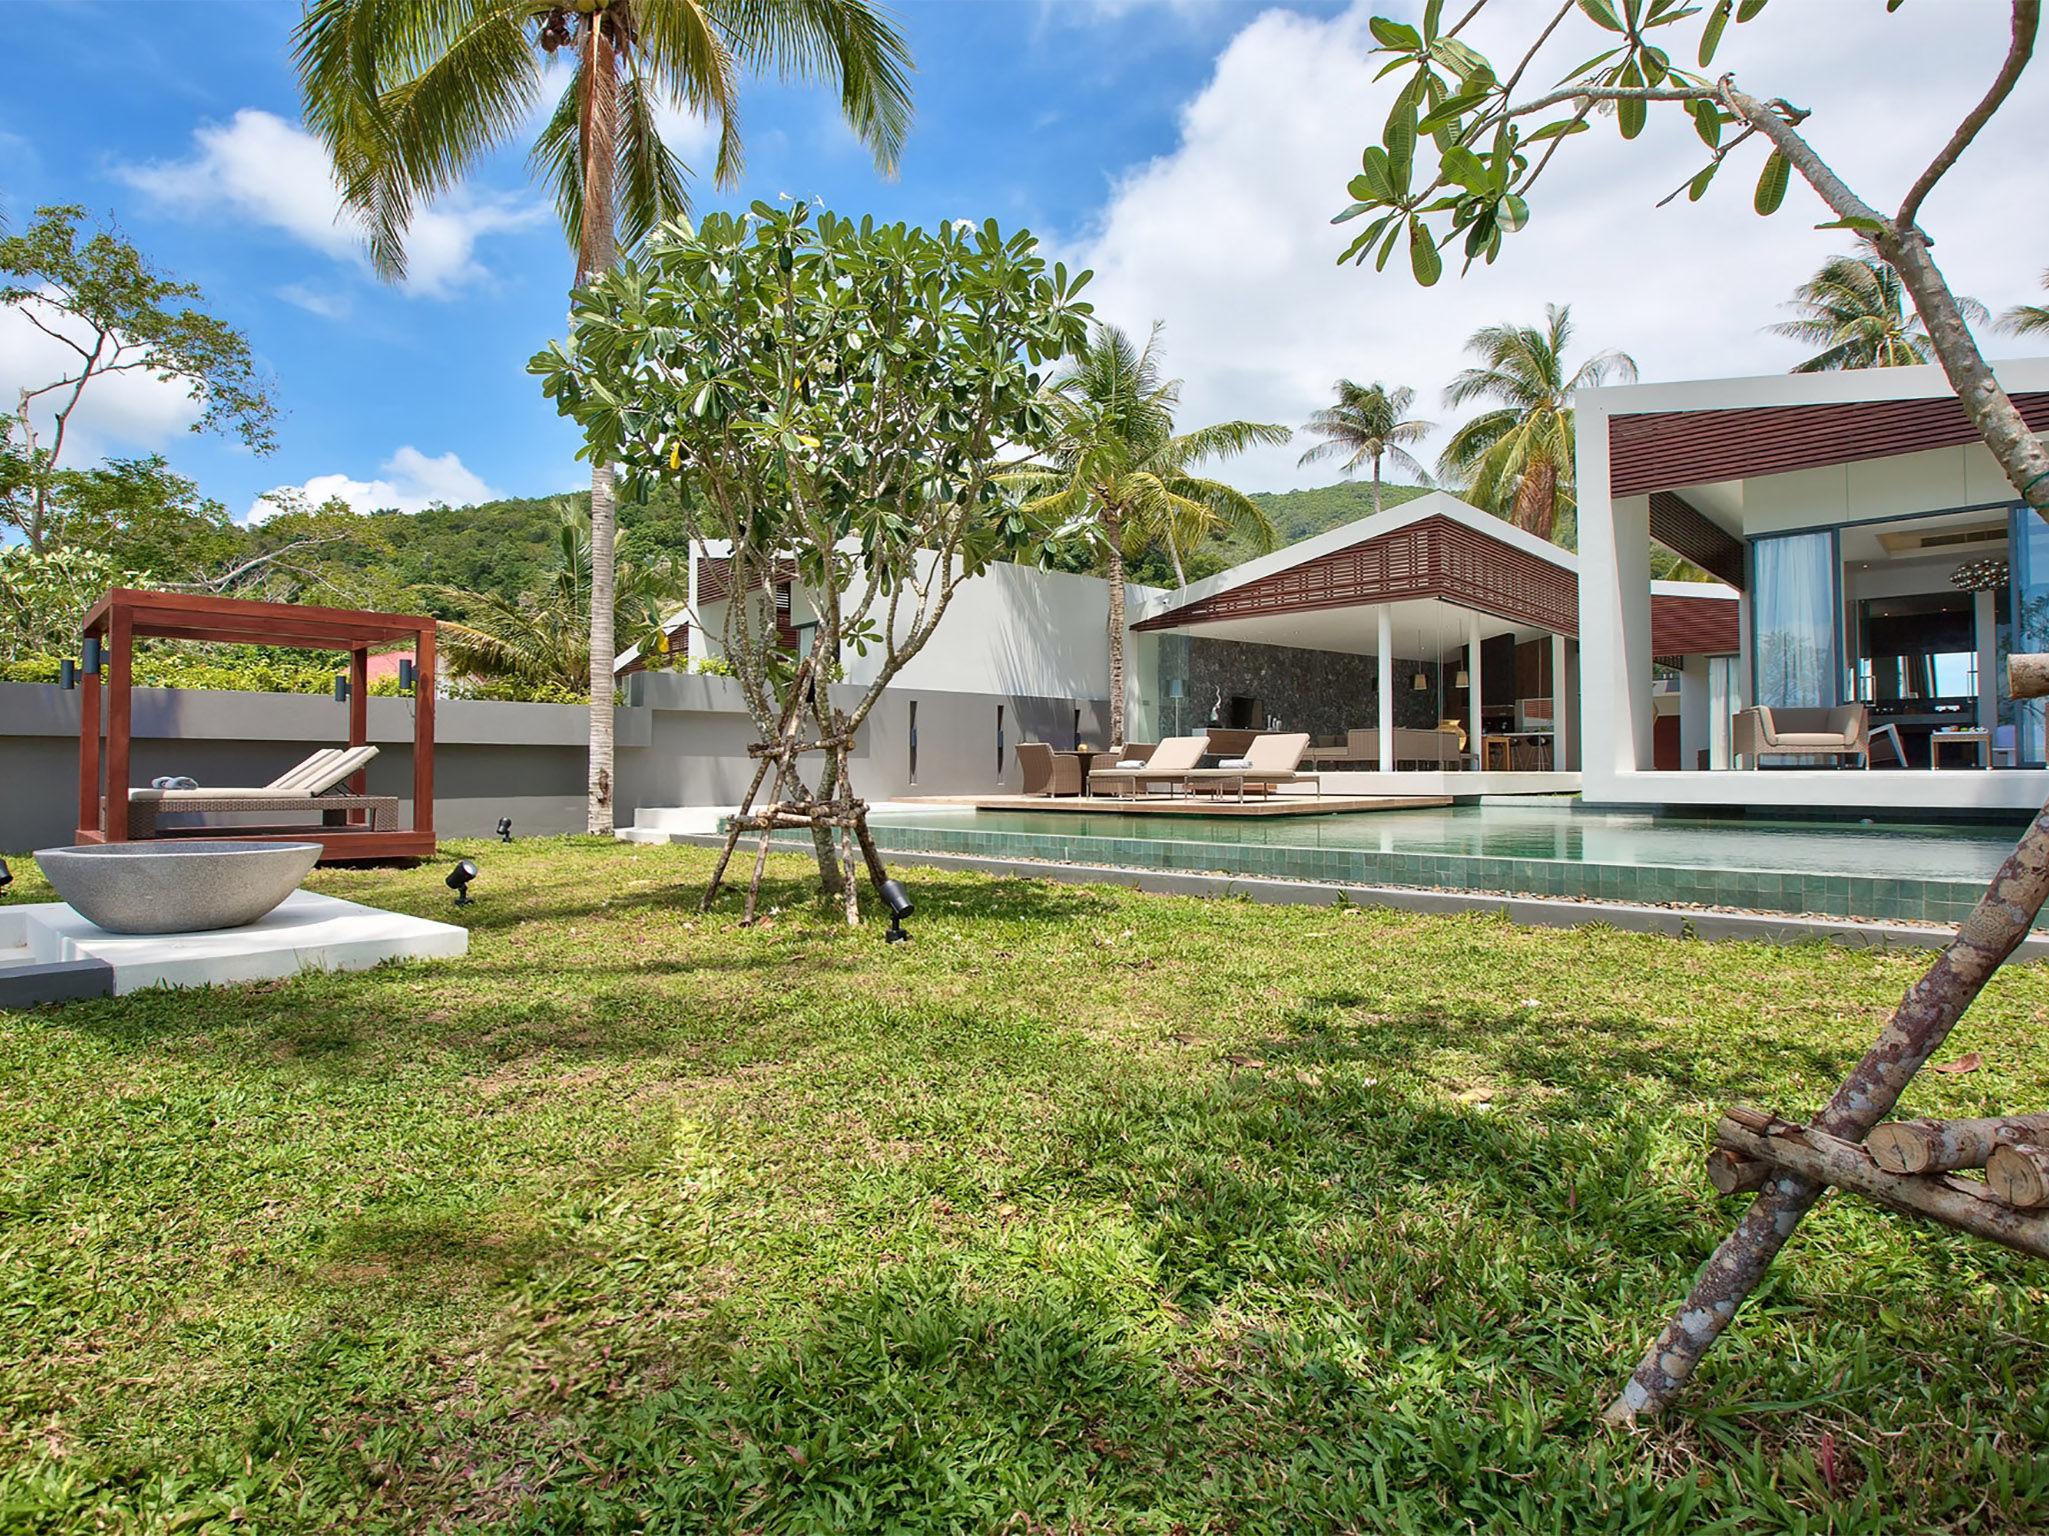 Villa Neung at Mandalay Beach Villas - Outdoor spaces